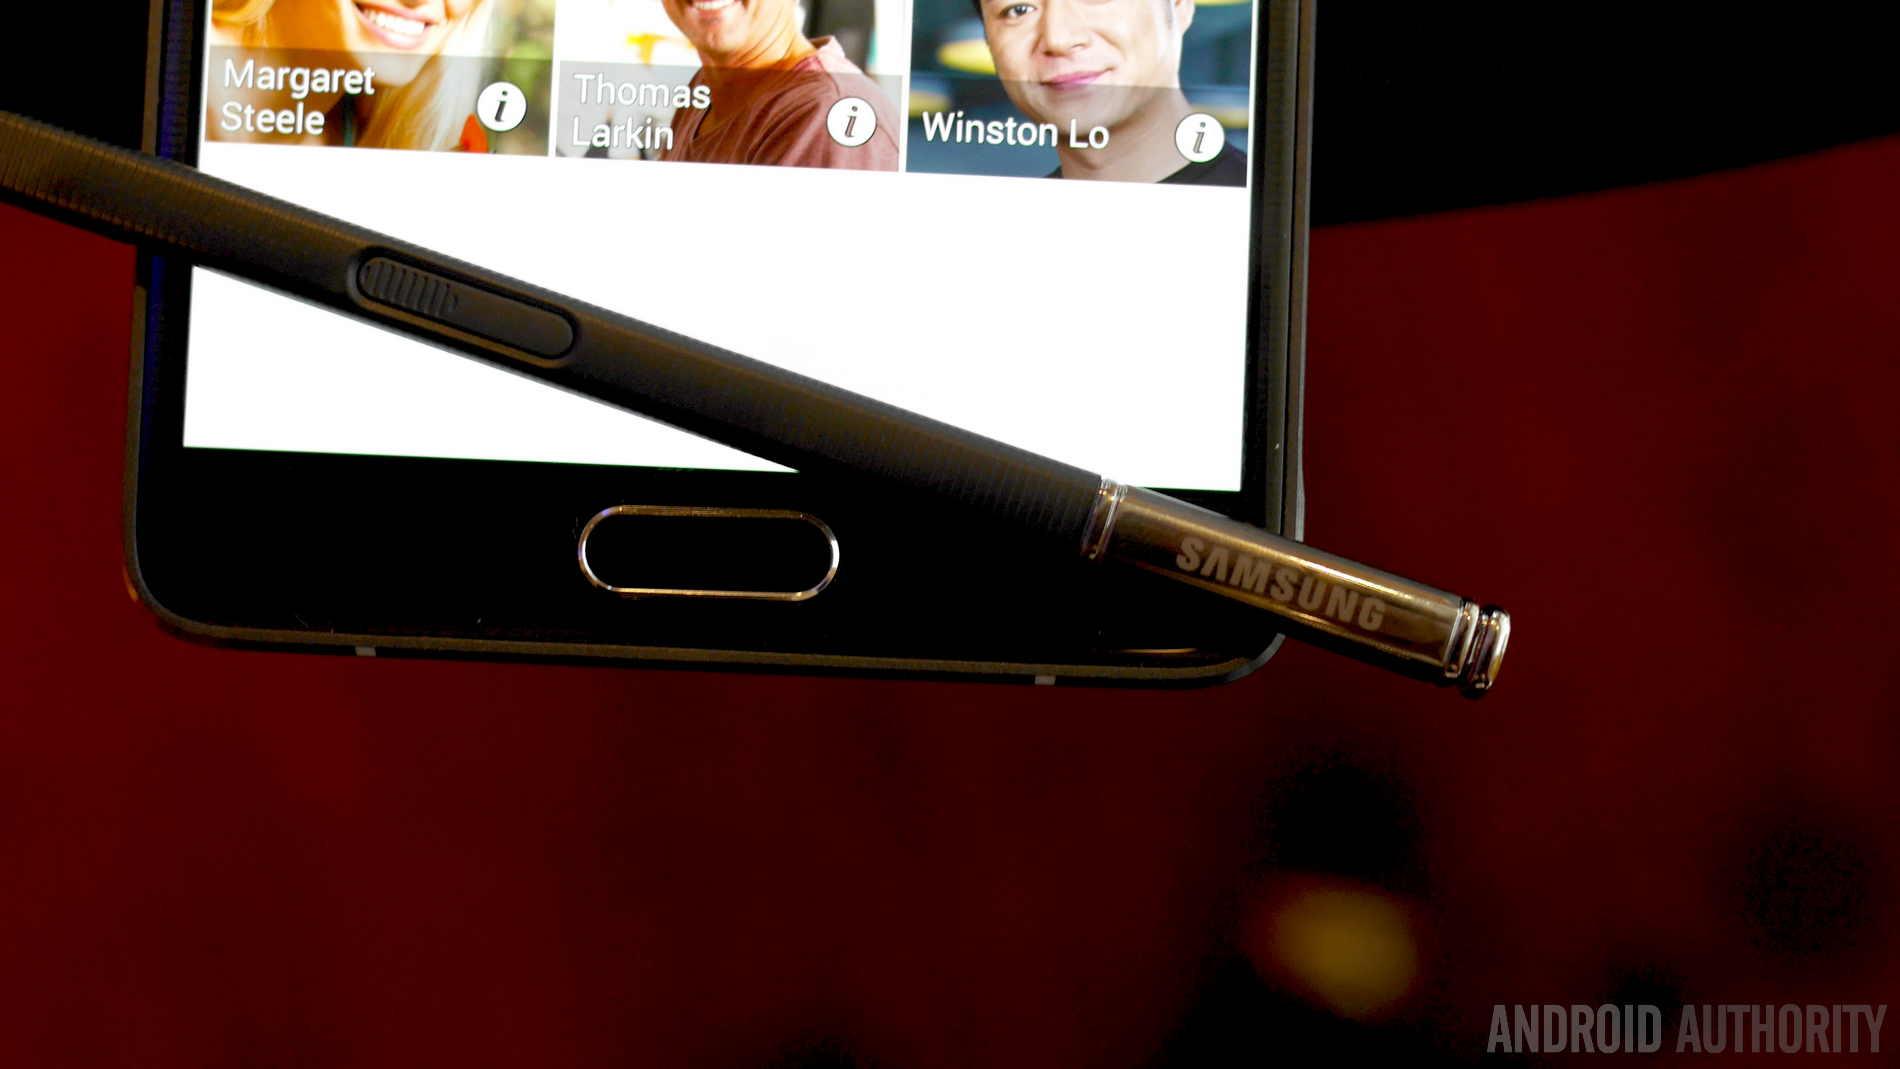 samsung galaxy note 4 s pen stylus 3